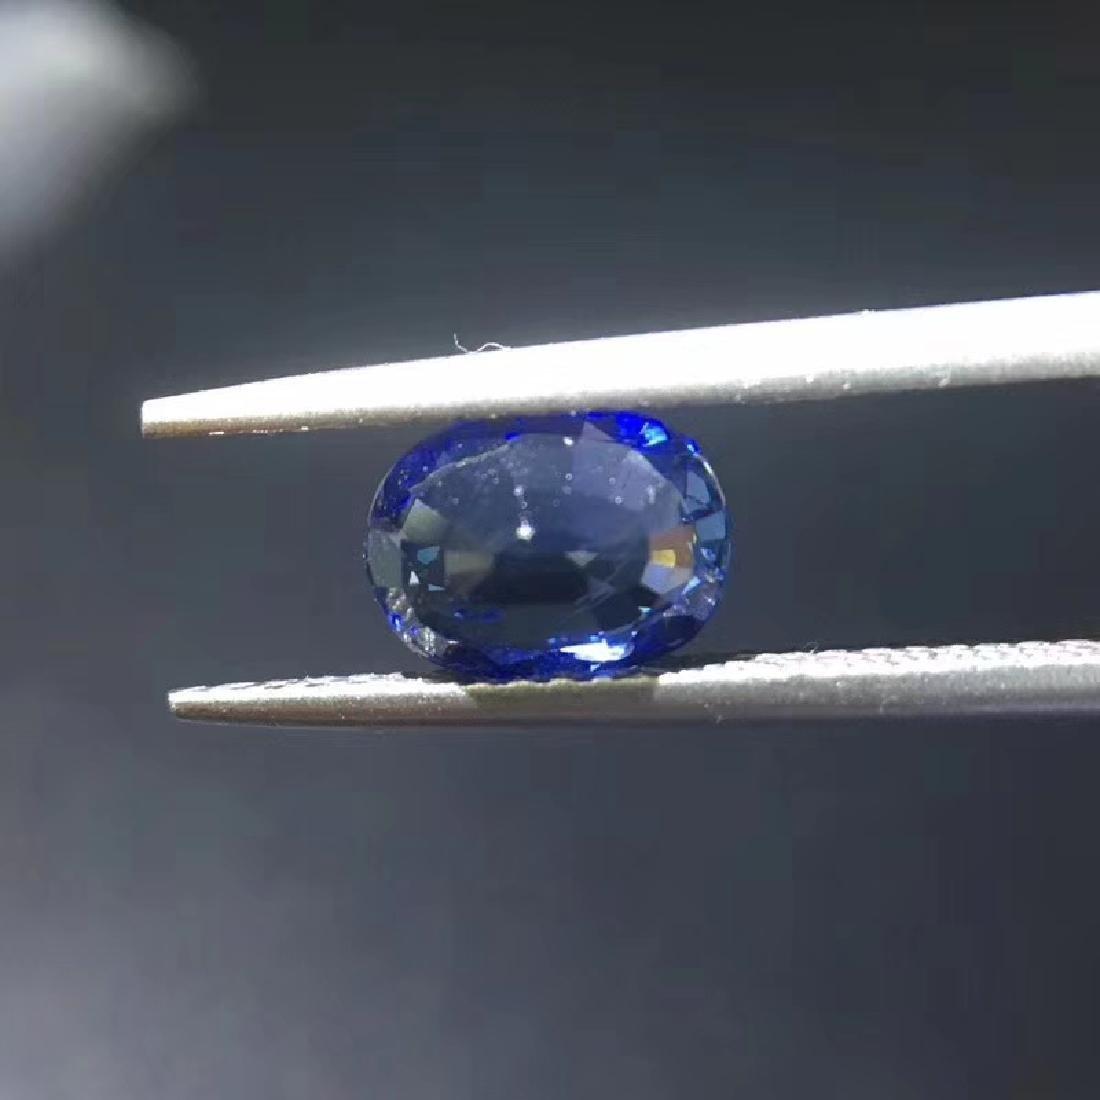 1.38 ct Sapphire 5.5*7.4*3.5 mm Oval Cut - 5